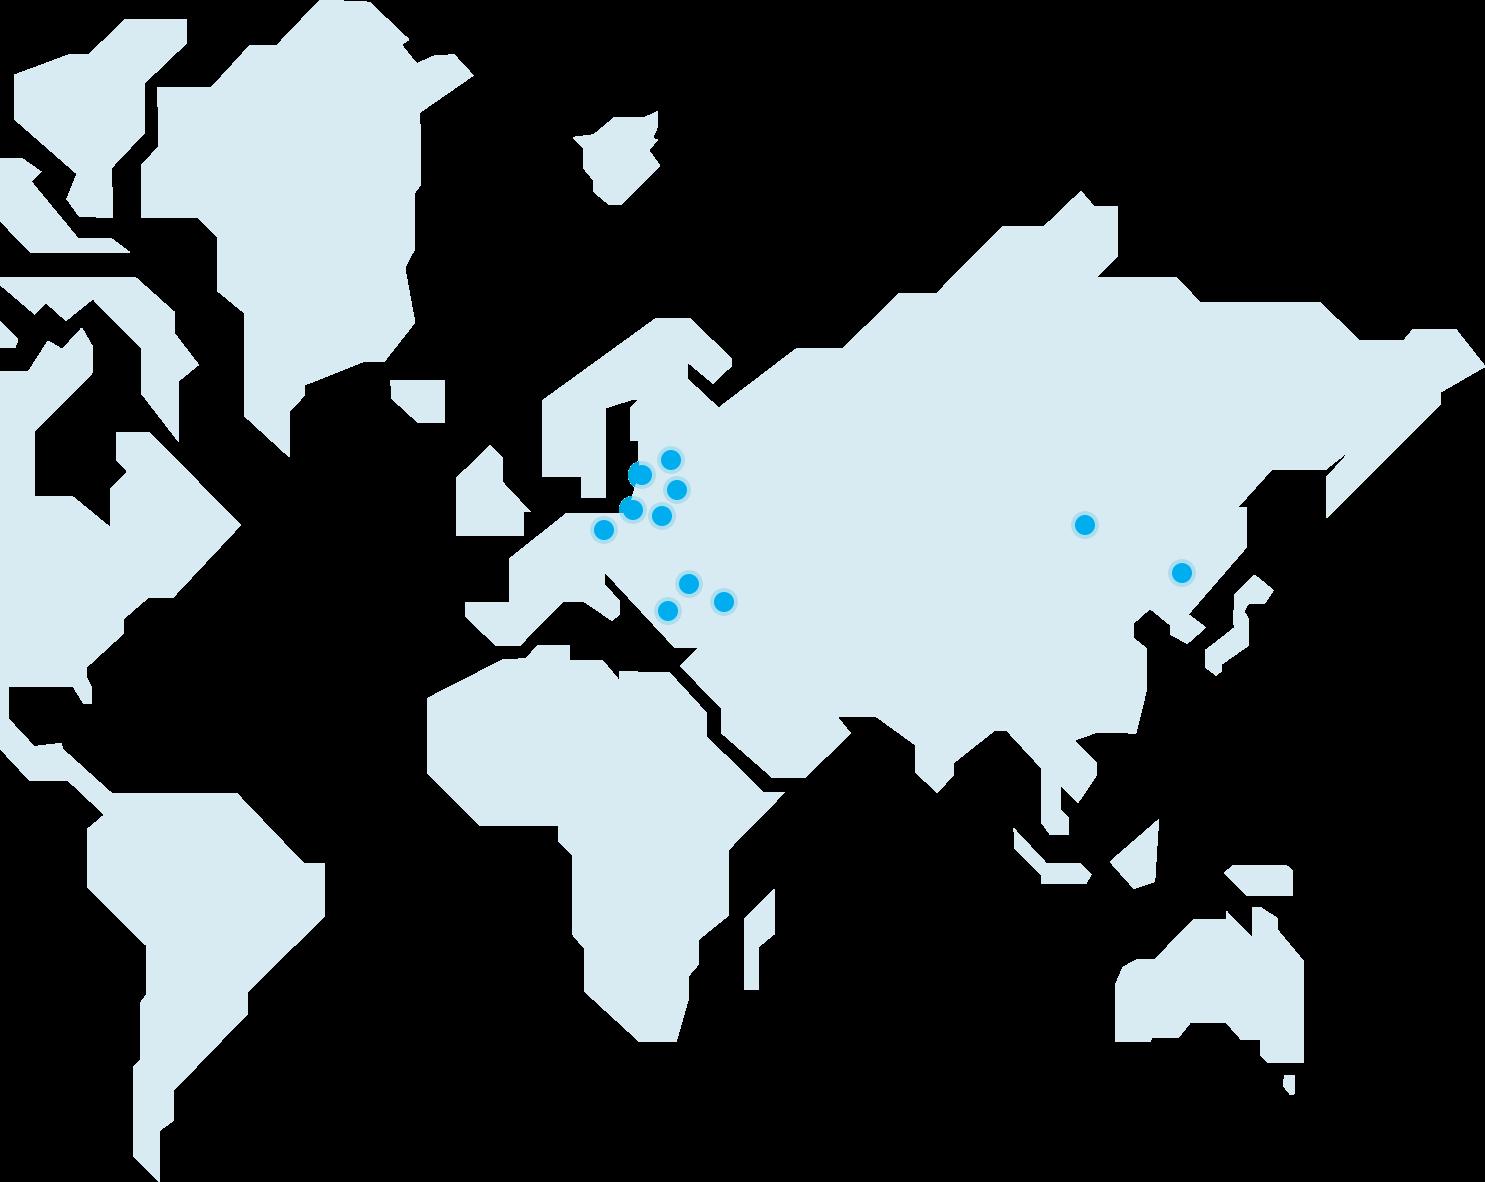 sea-map